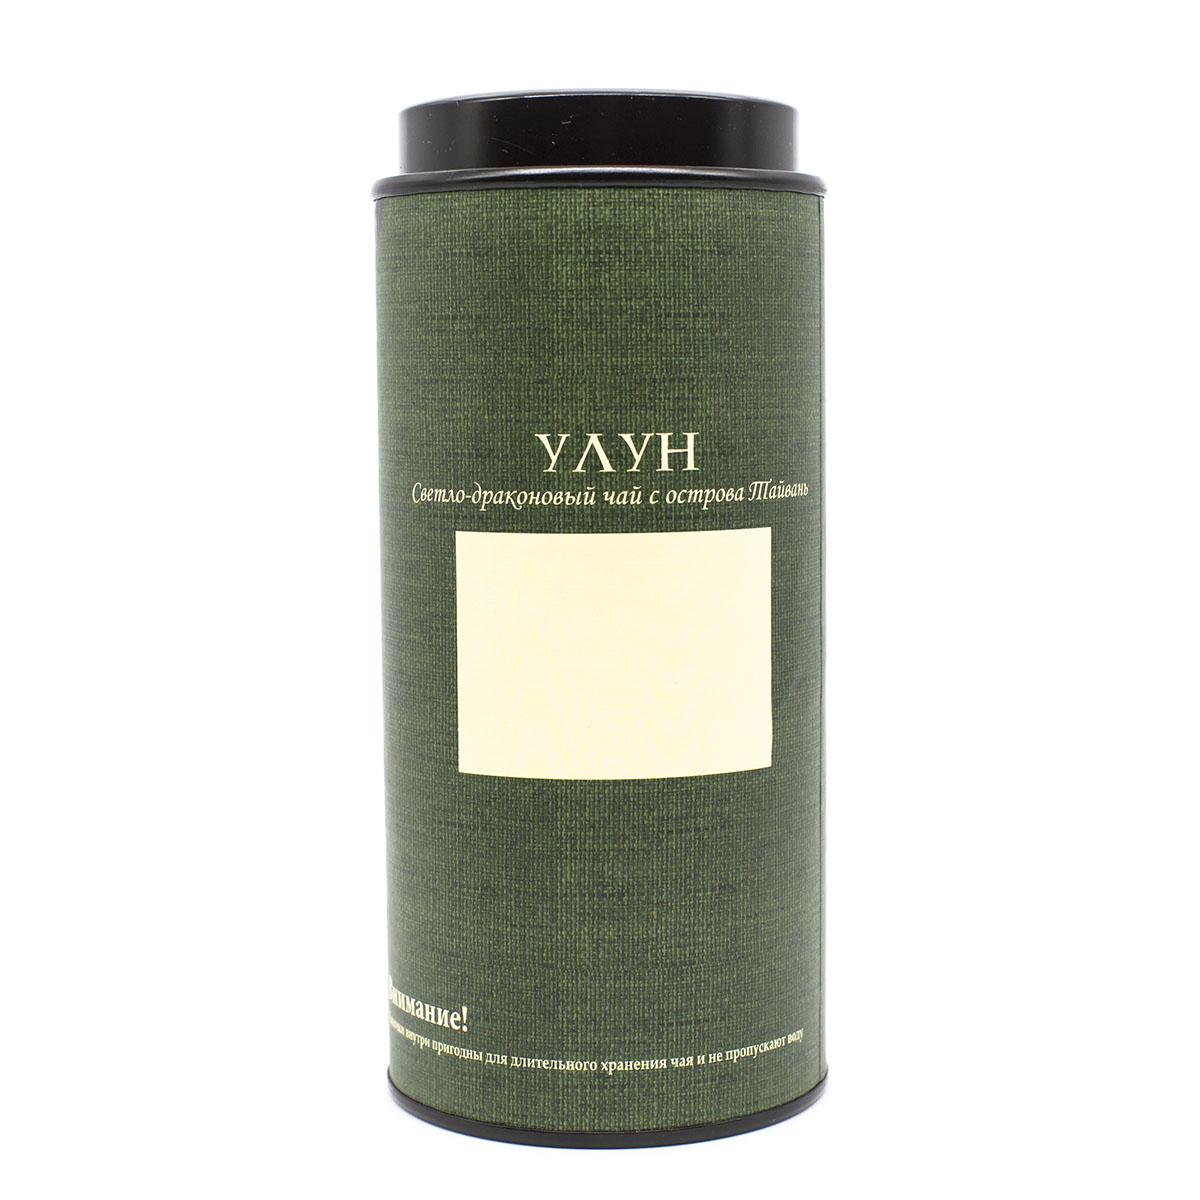 Банка картонная Мелодия неба - Улун тайваньский 76*175 maitre de the женьшень улун зеленый листовой чай 150 г жестяная банка